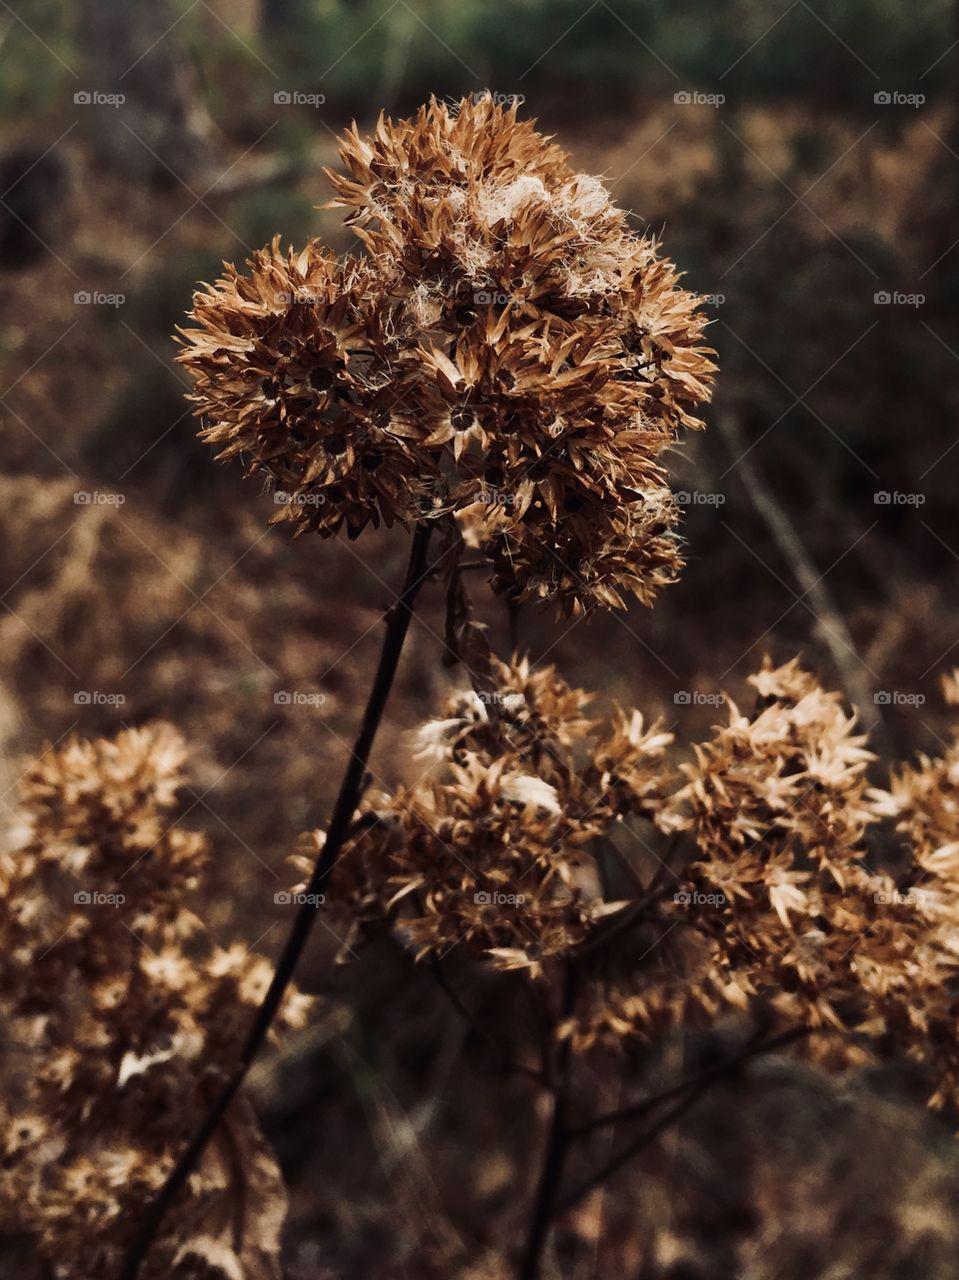 Senesced weeds in winter's forest